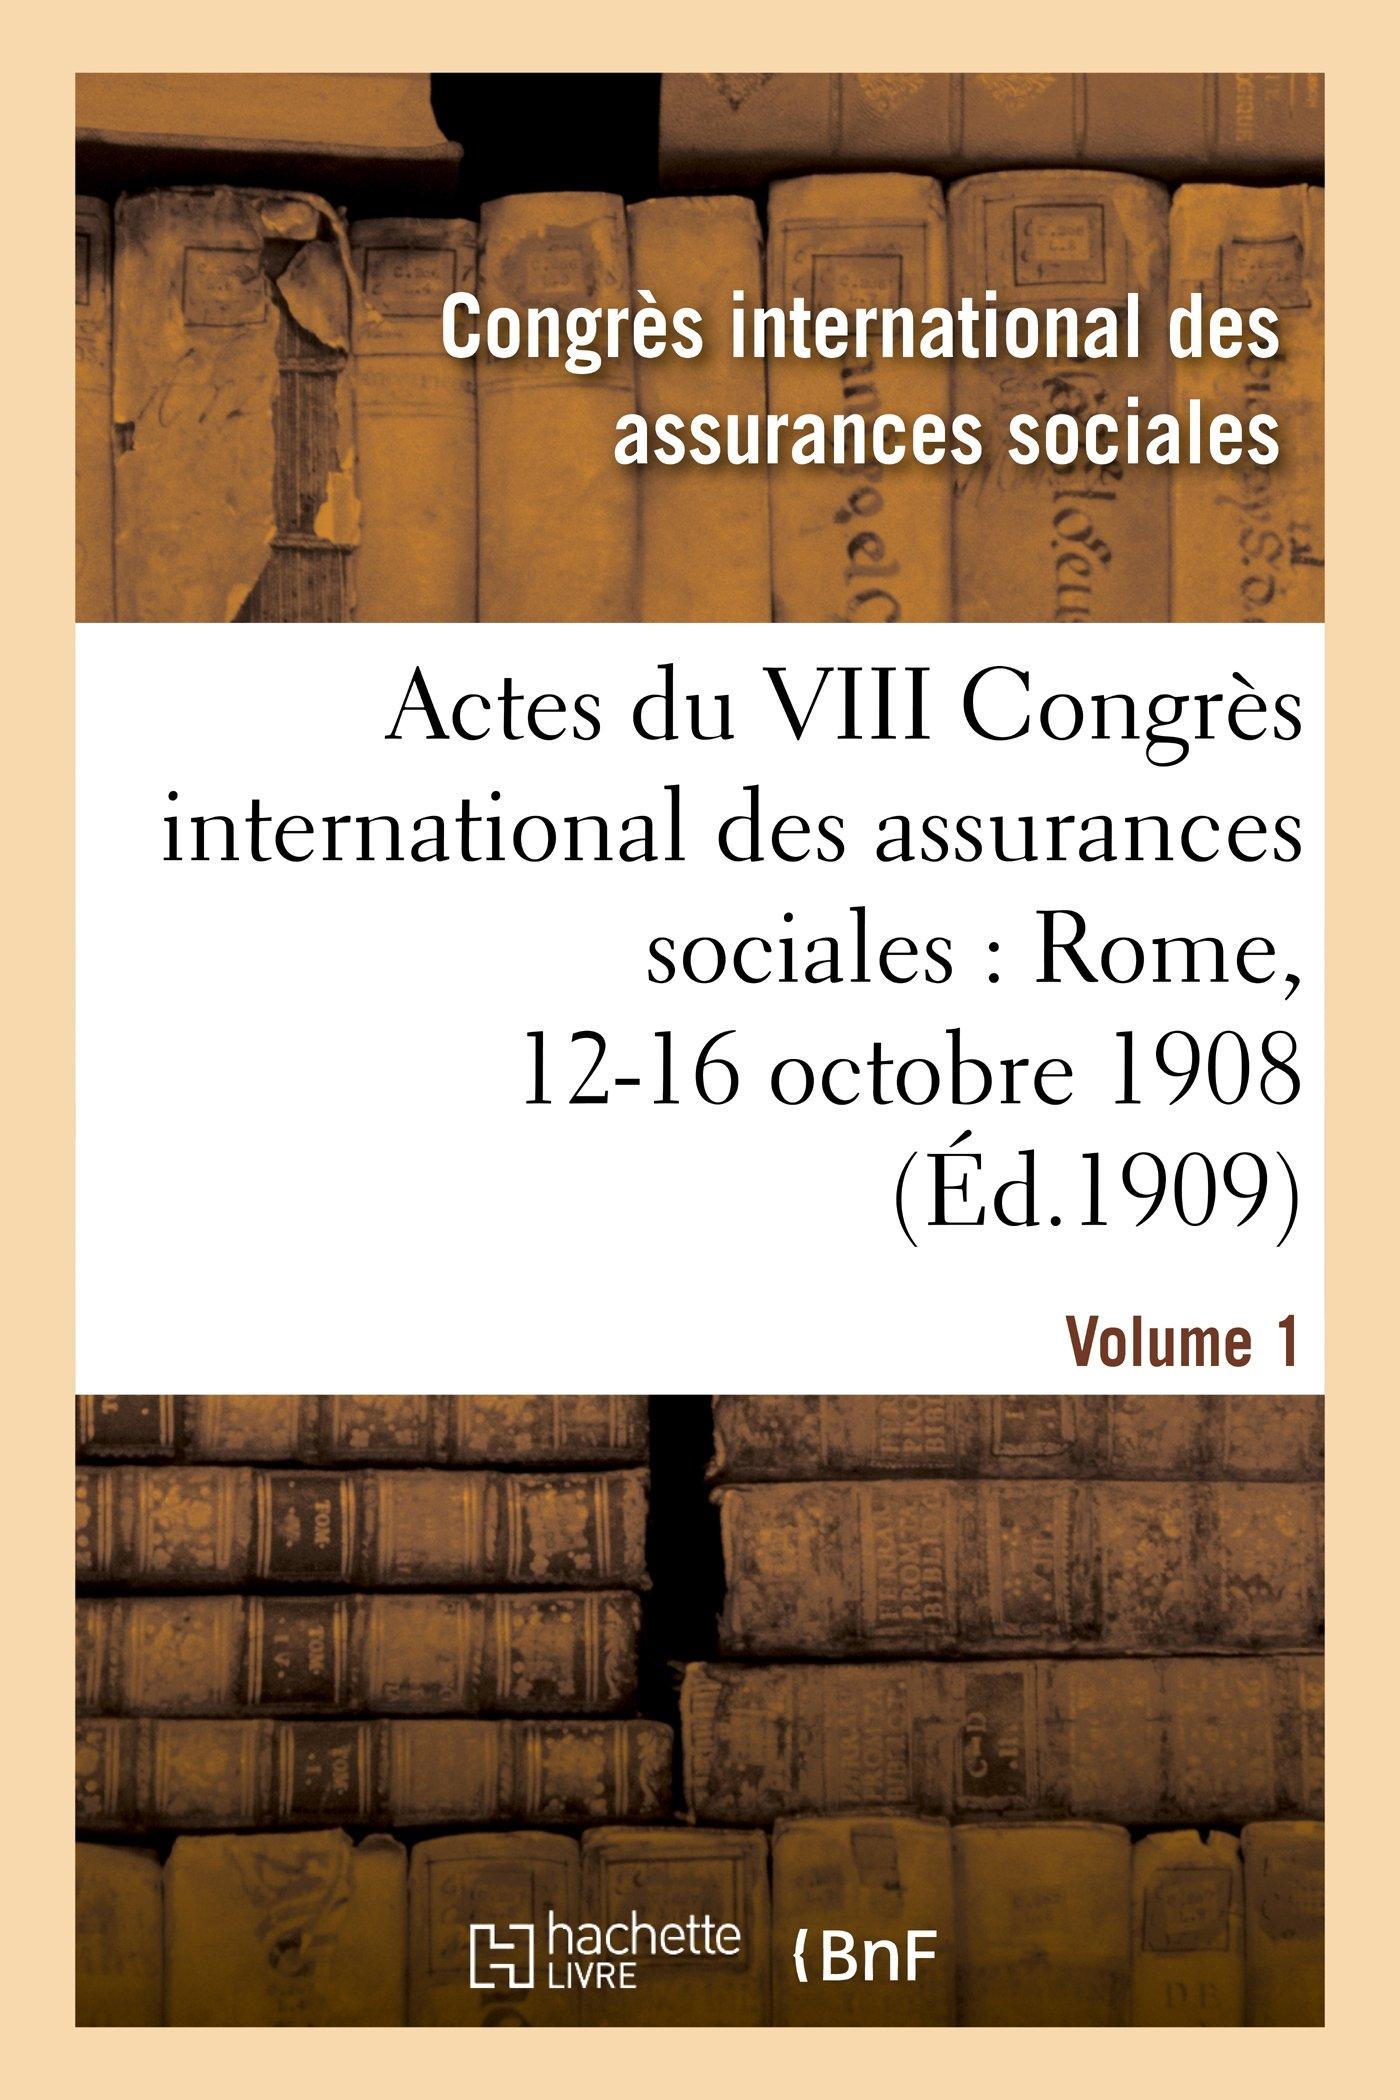 Download Actes Du VIII Congres International Des Assurances Sociales: Rome, 12-16 Octobre 1908. Volume 1 (Sciences Sociales) (French Edition) PDF